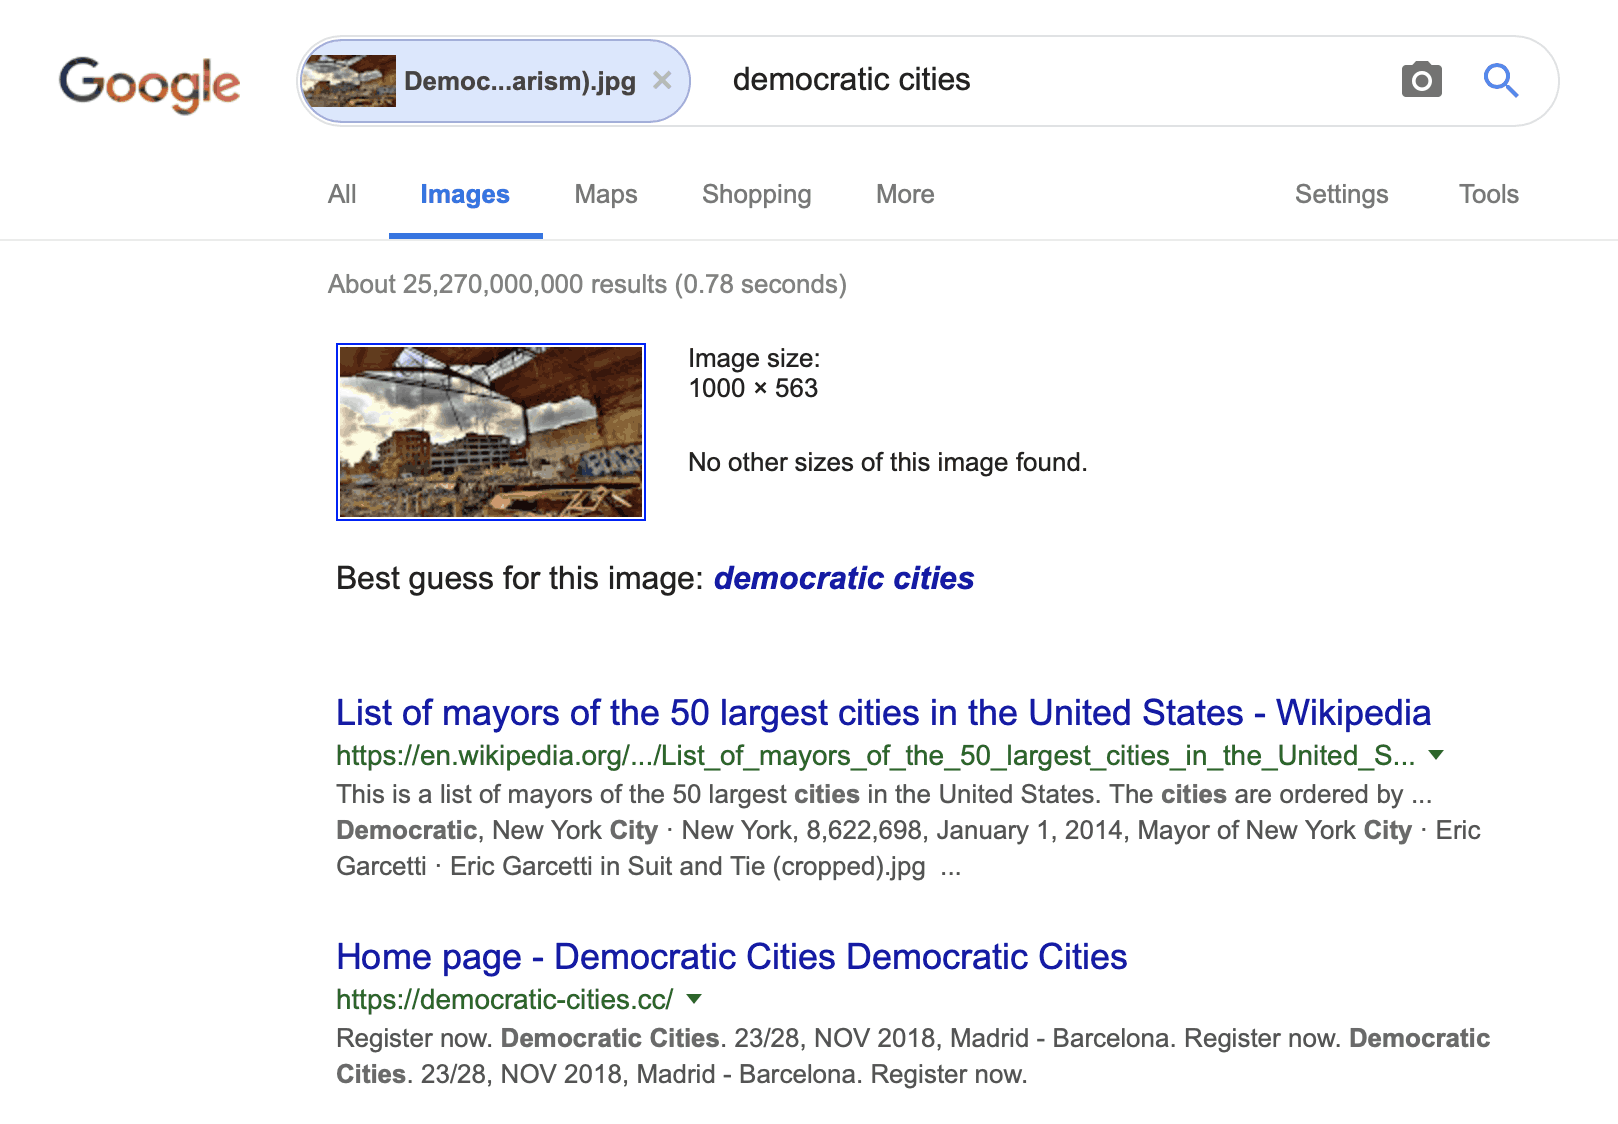 Best guess: Democratic cities